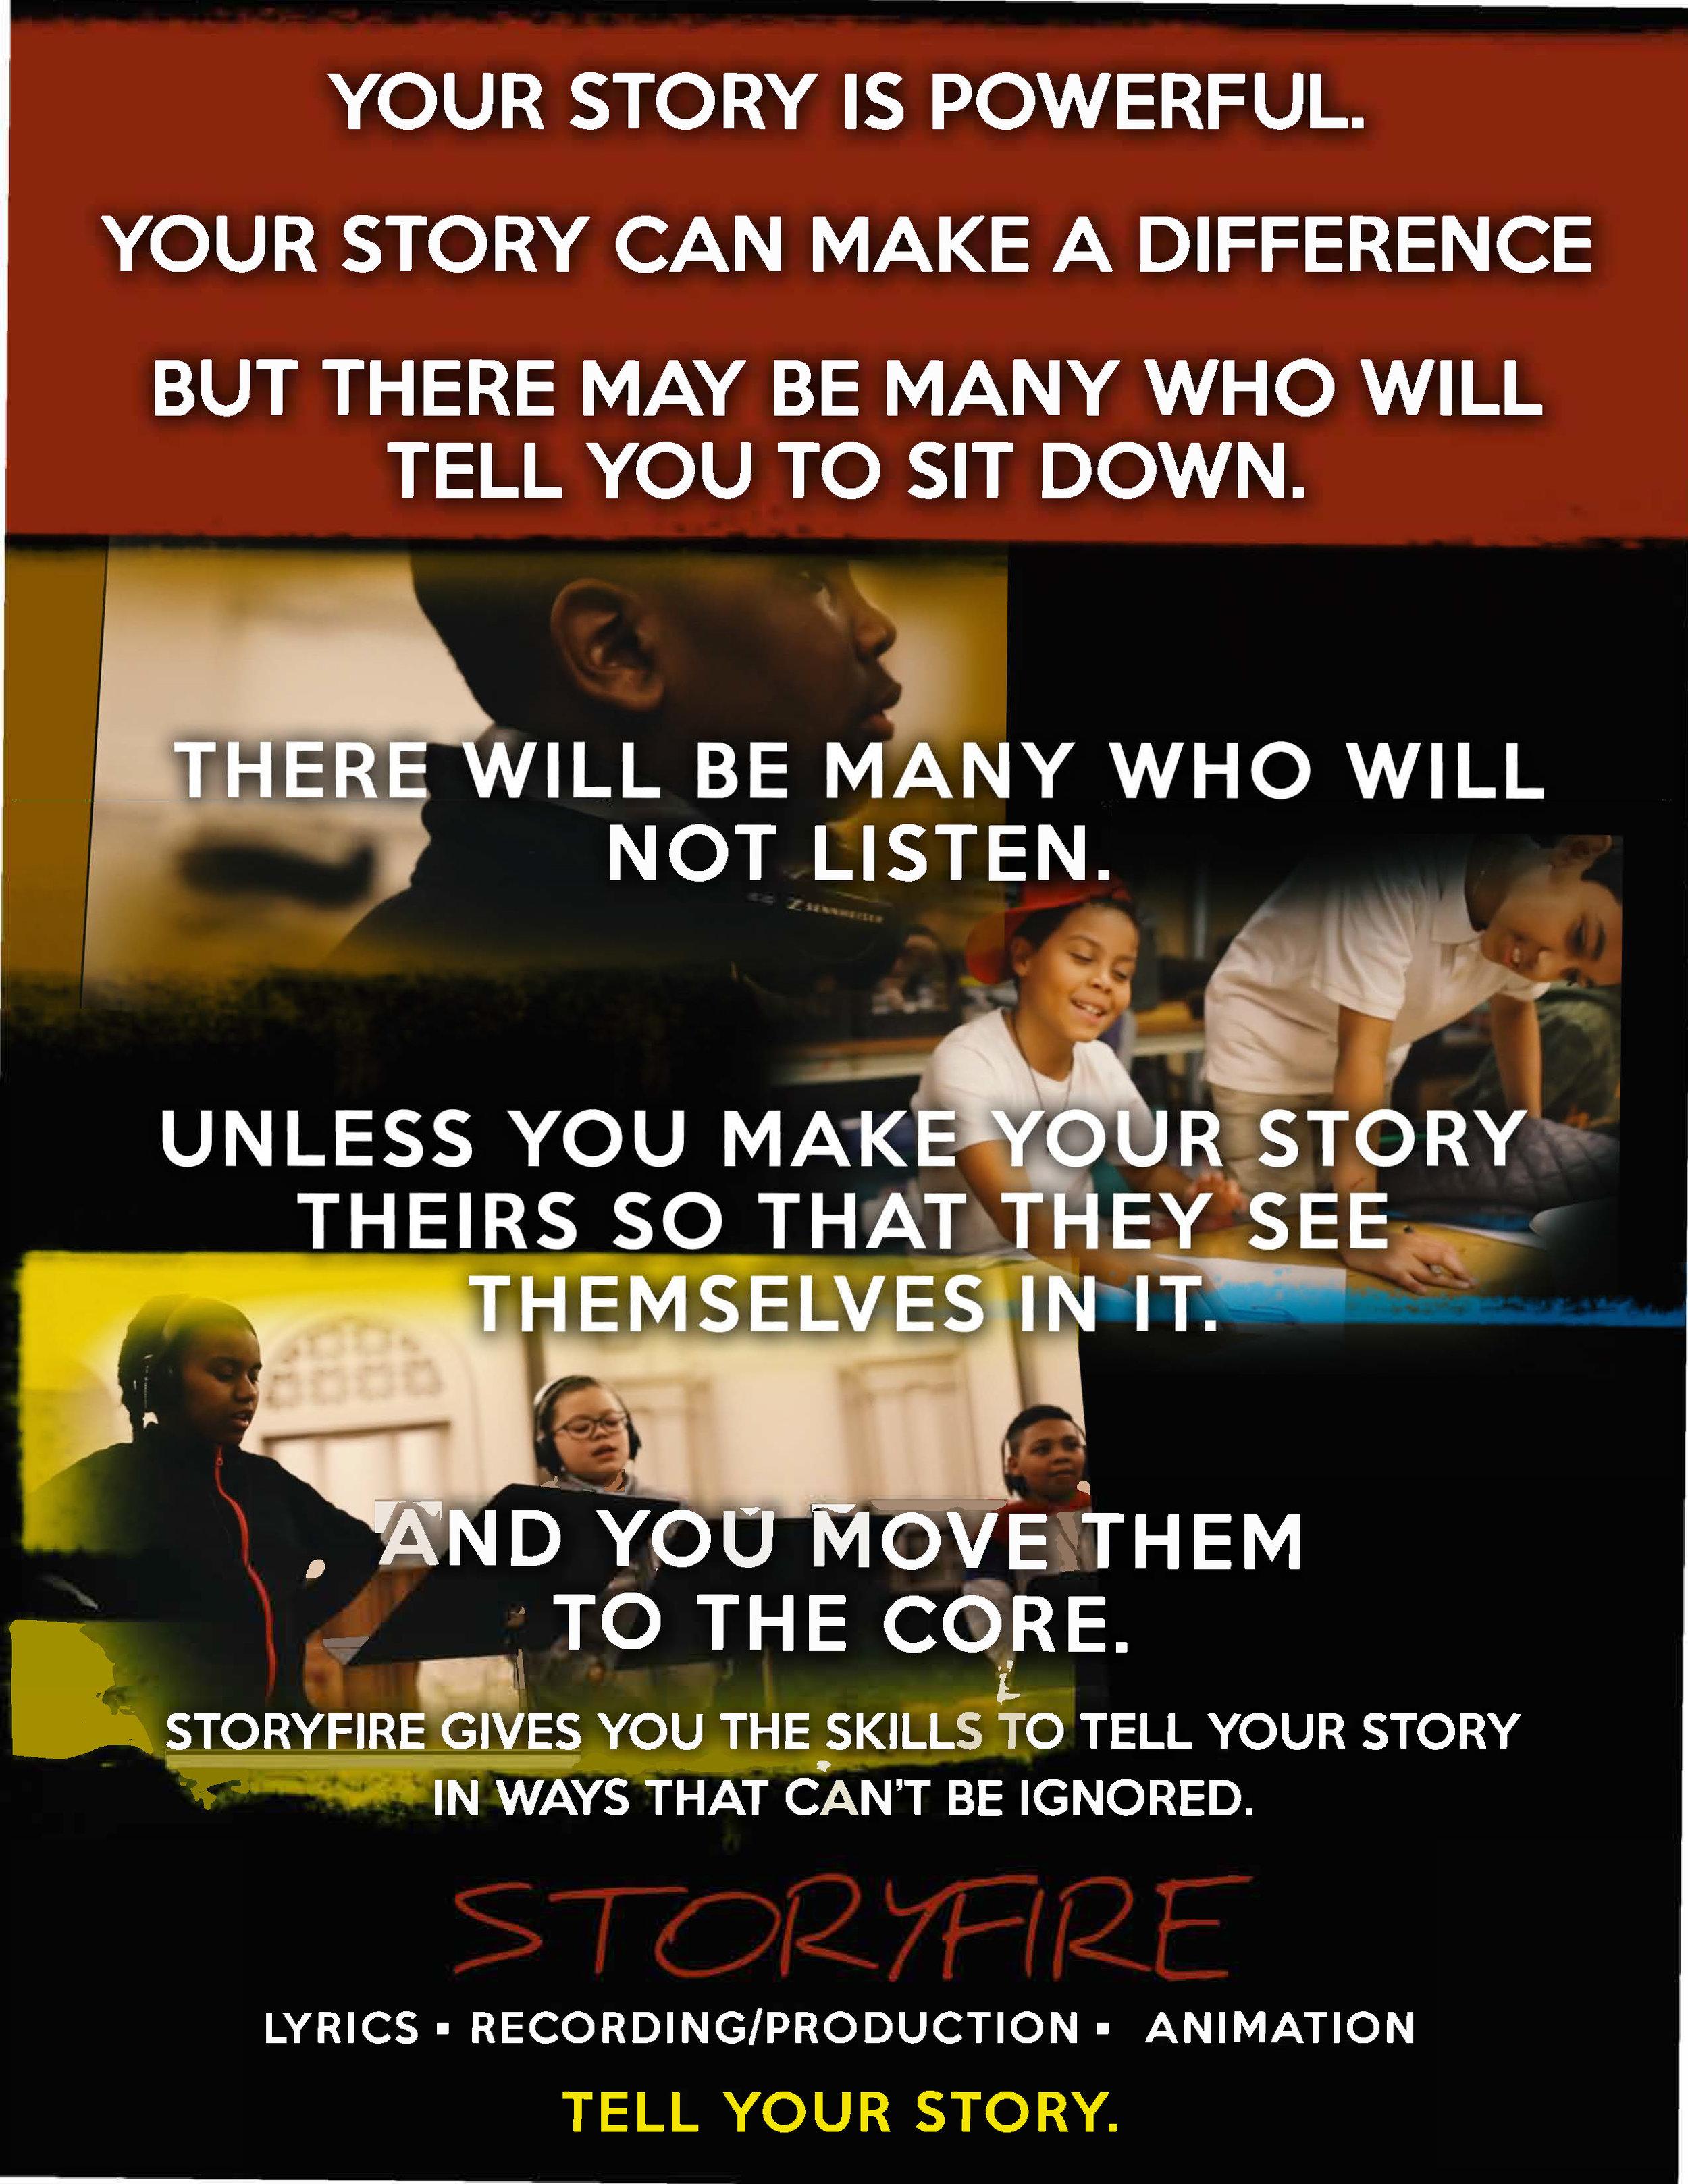 Download the StoryFire student flier